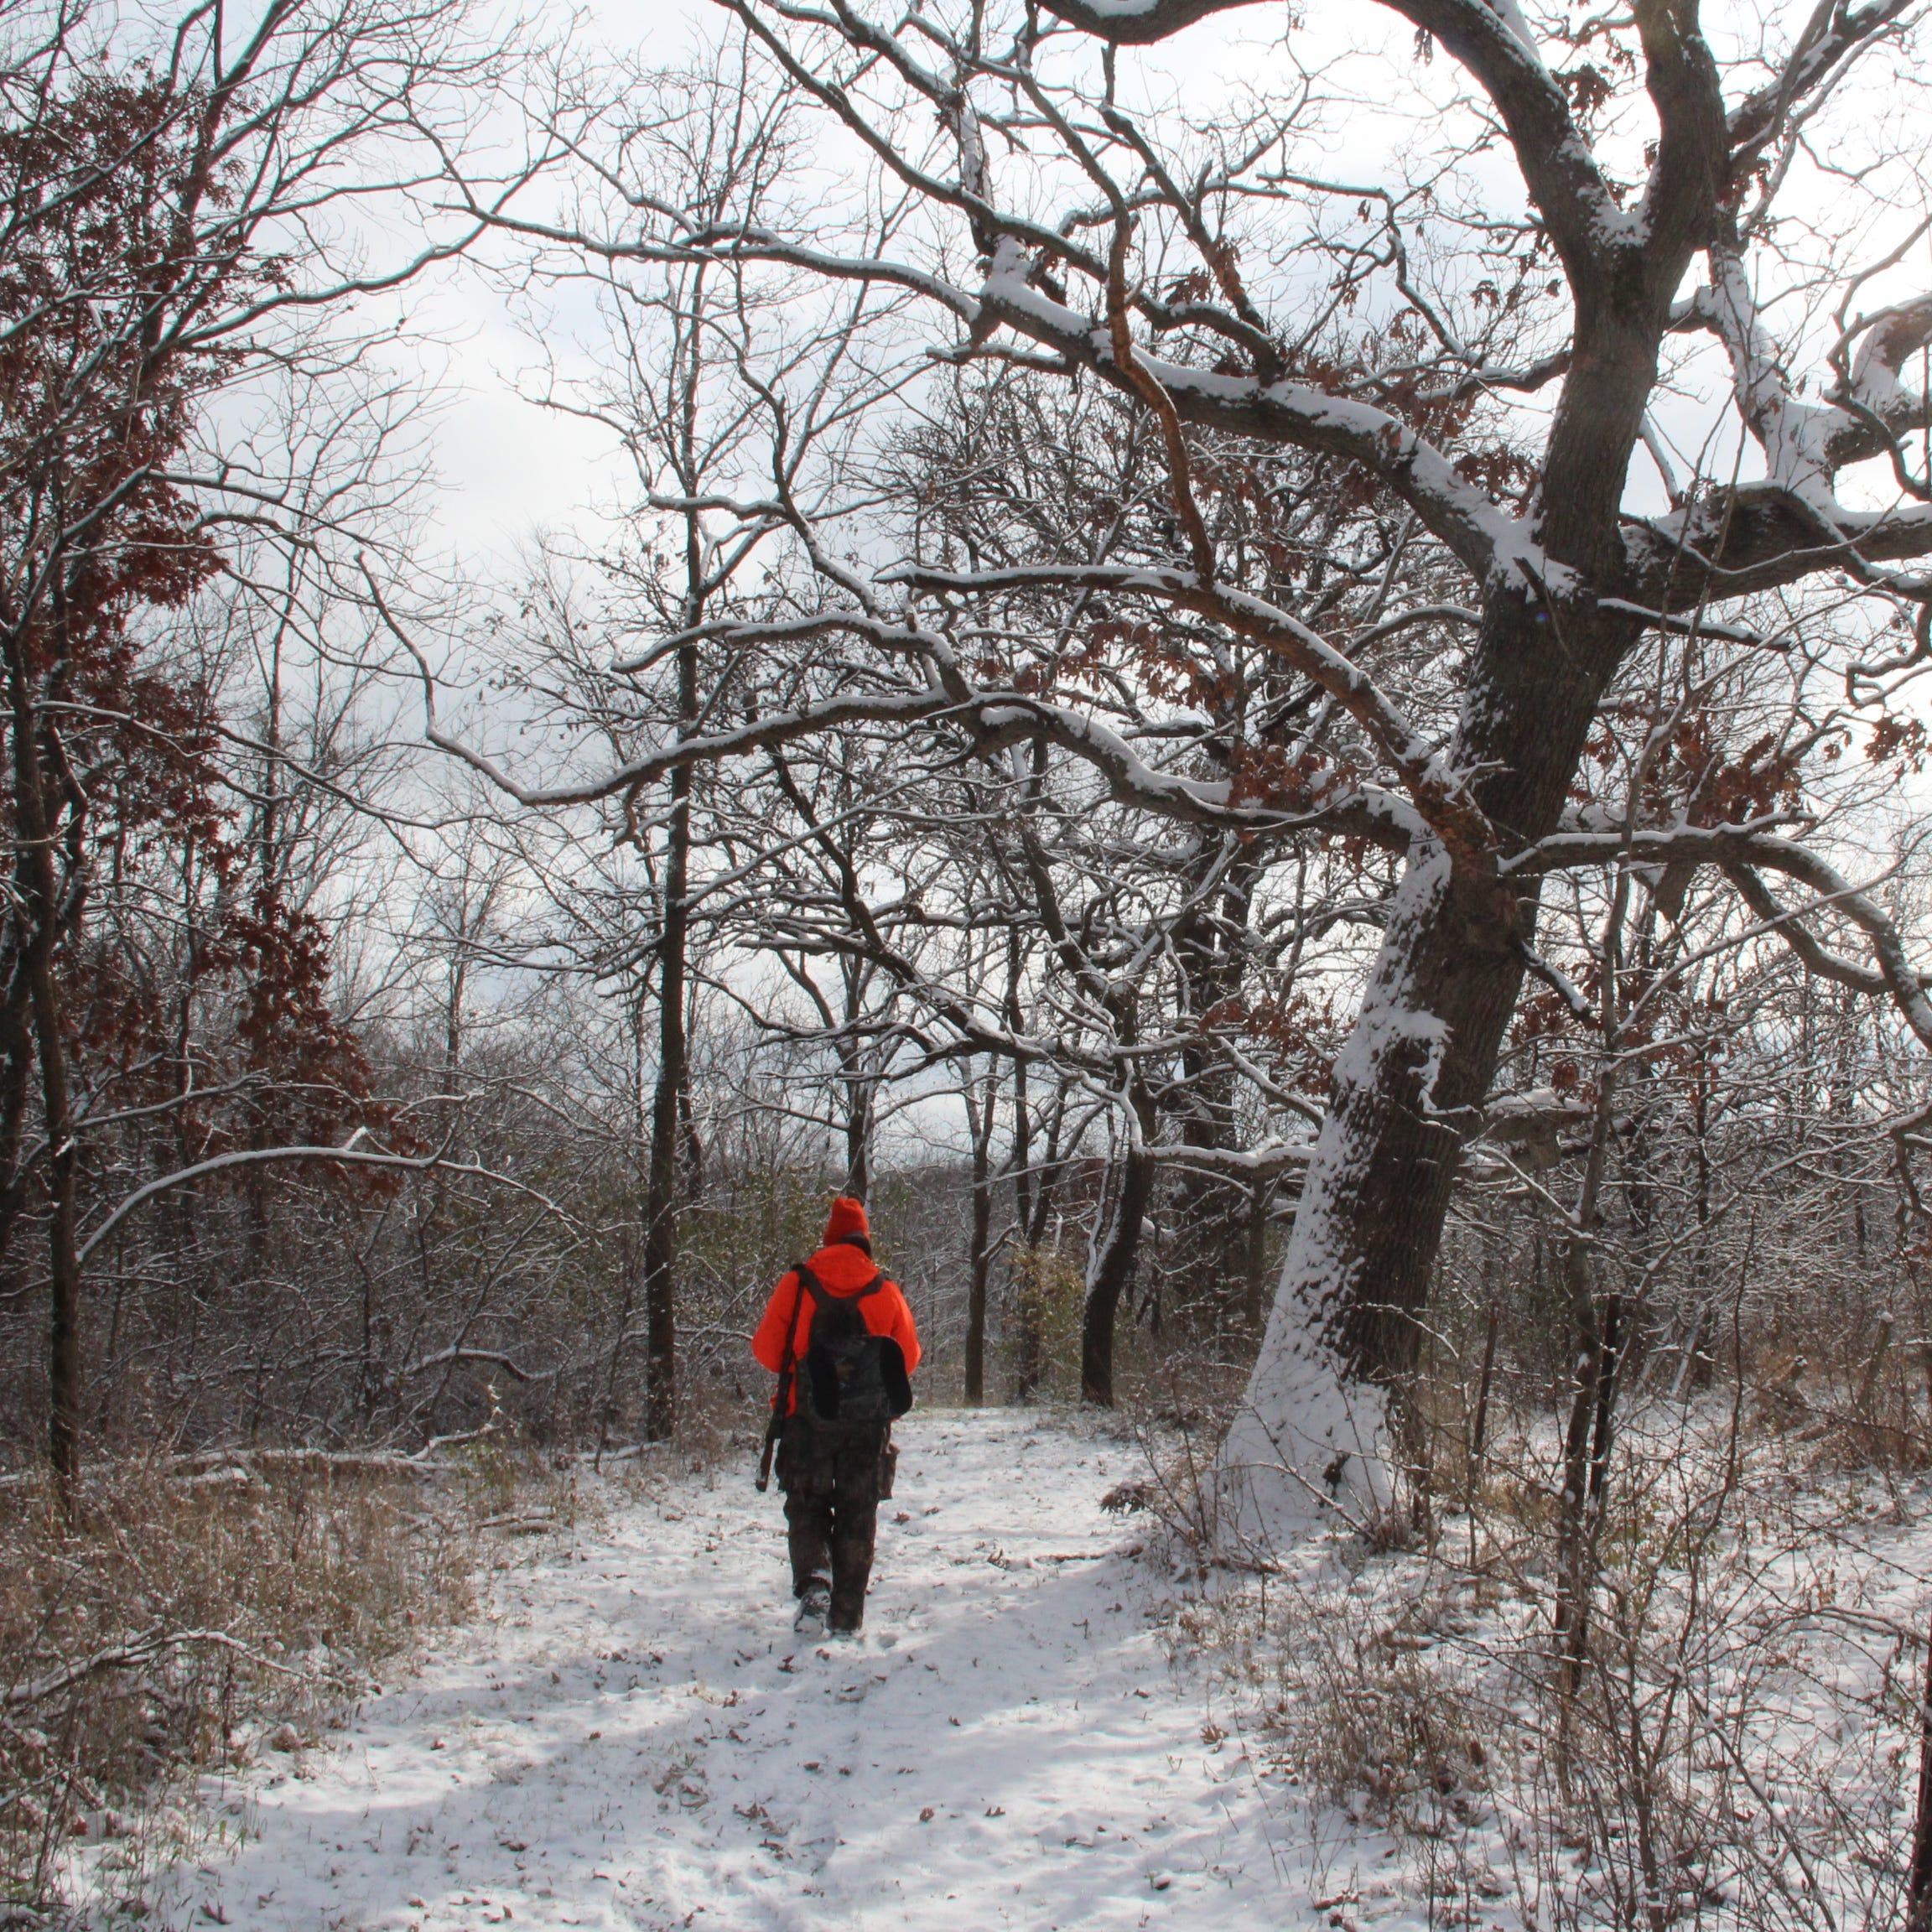 Good conditions and good deer activity reported from Wisconsin's gun deer hunting opener